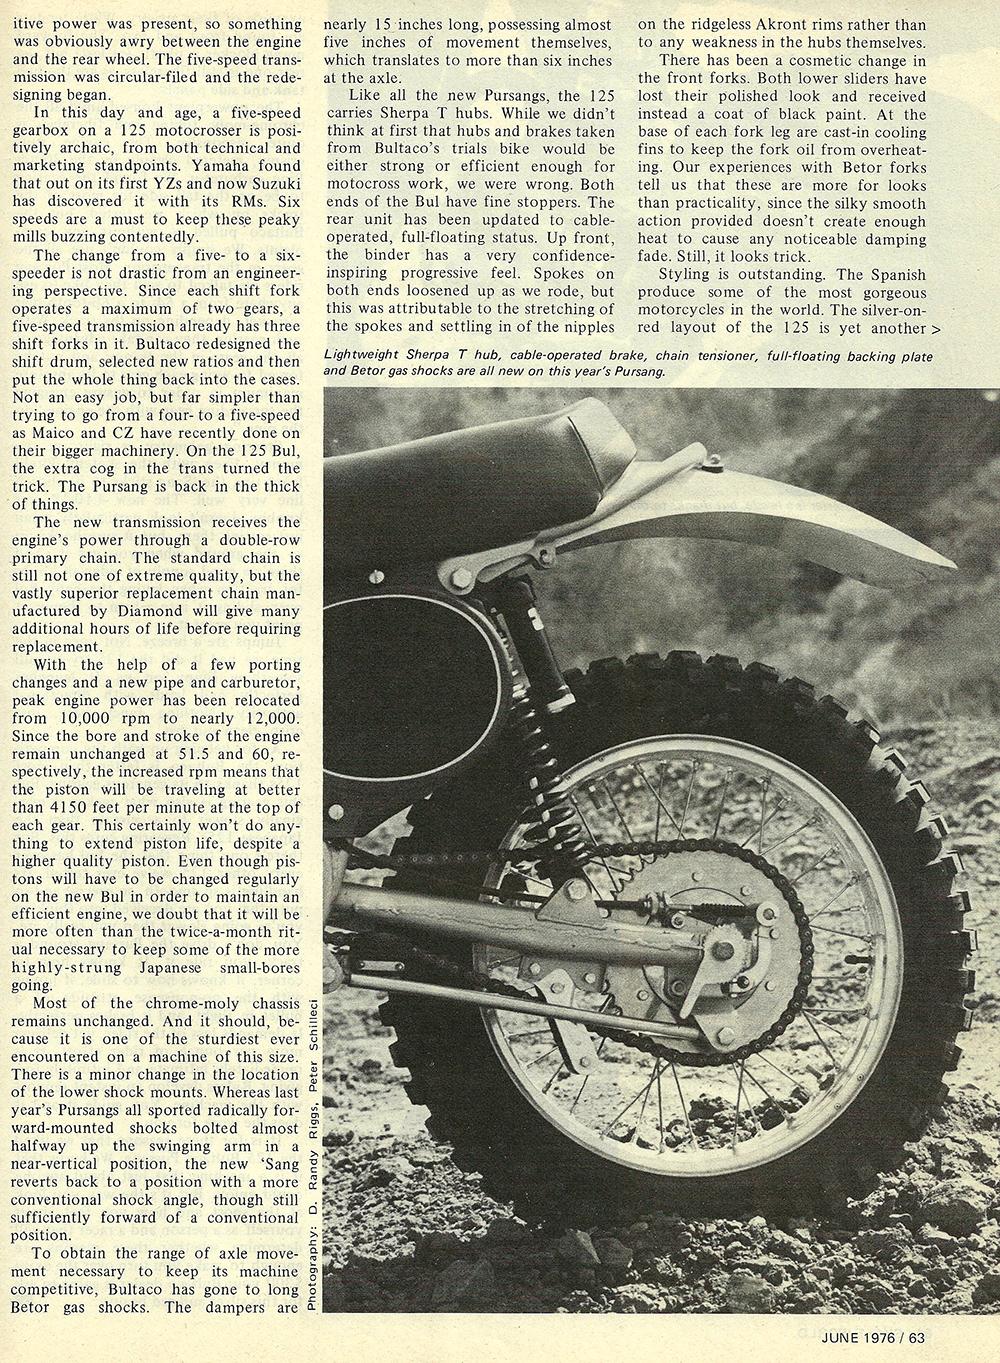 1976 Bultaco 125 Pursang road test 04.jpg